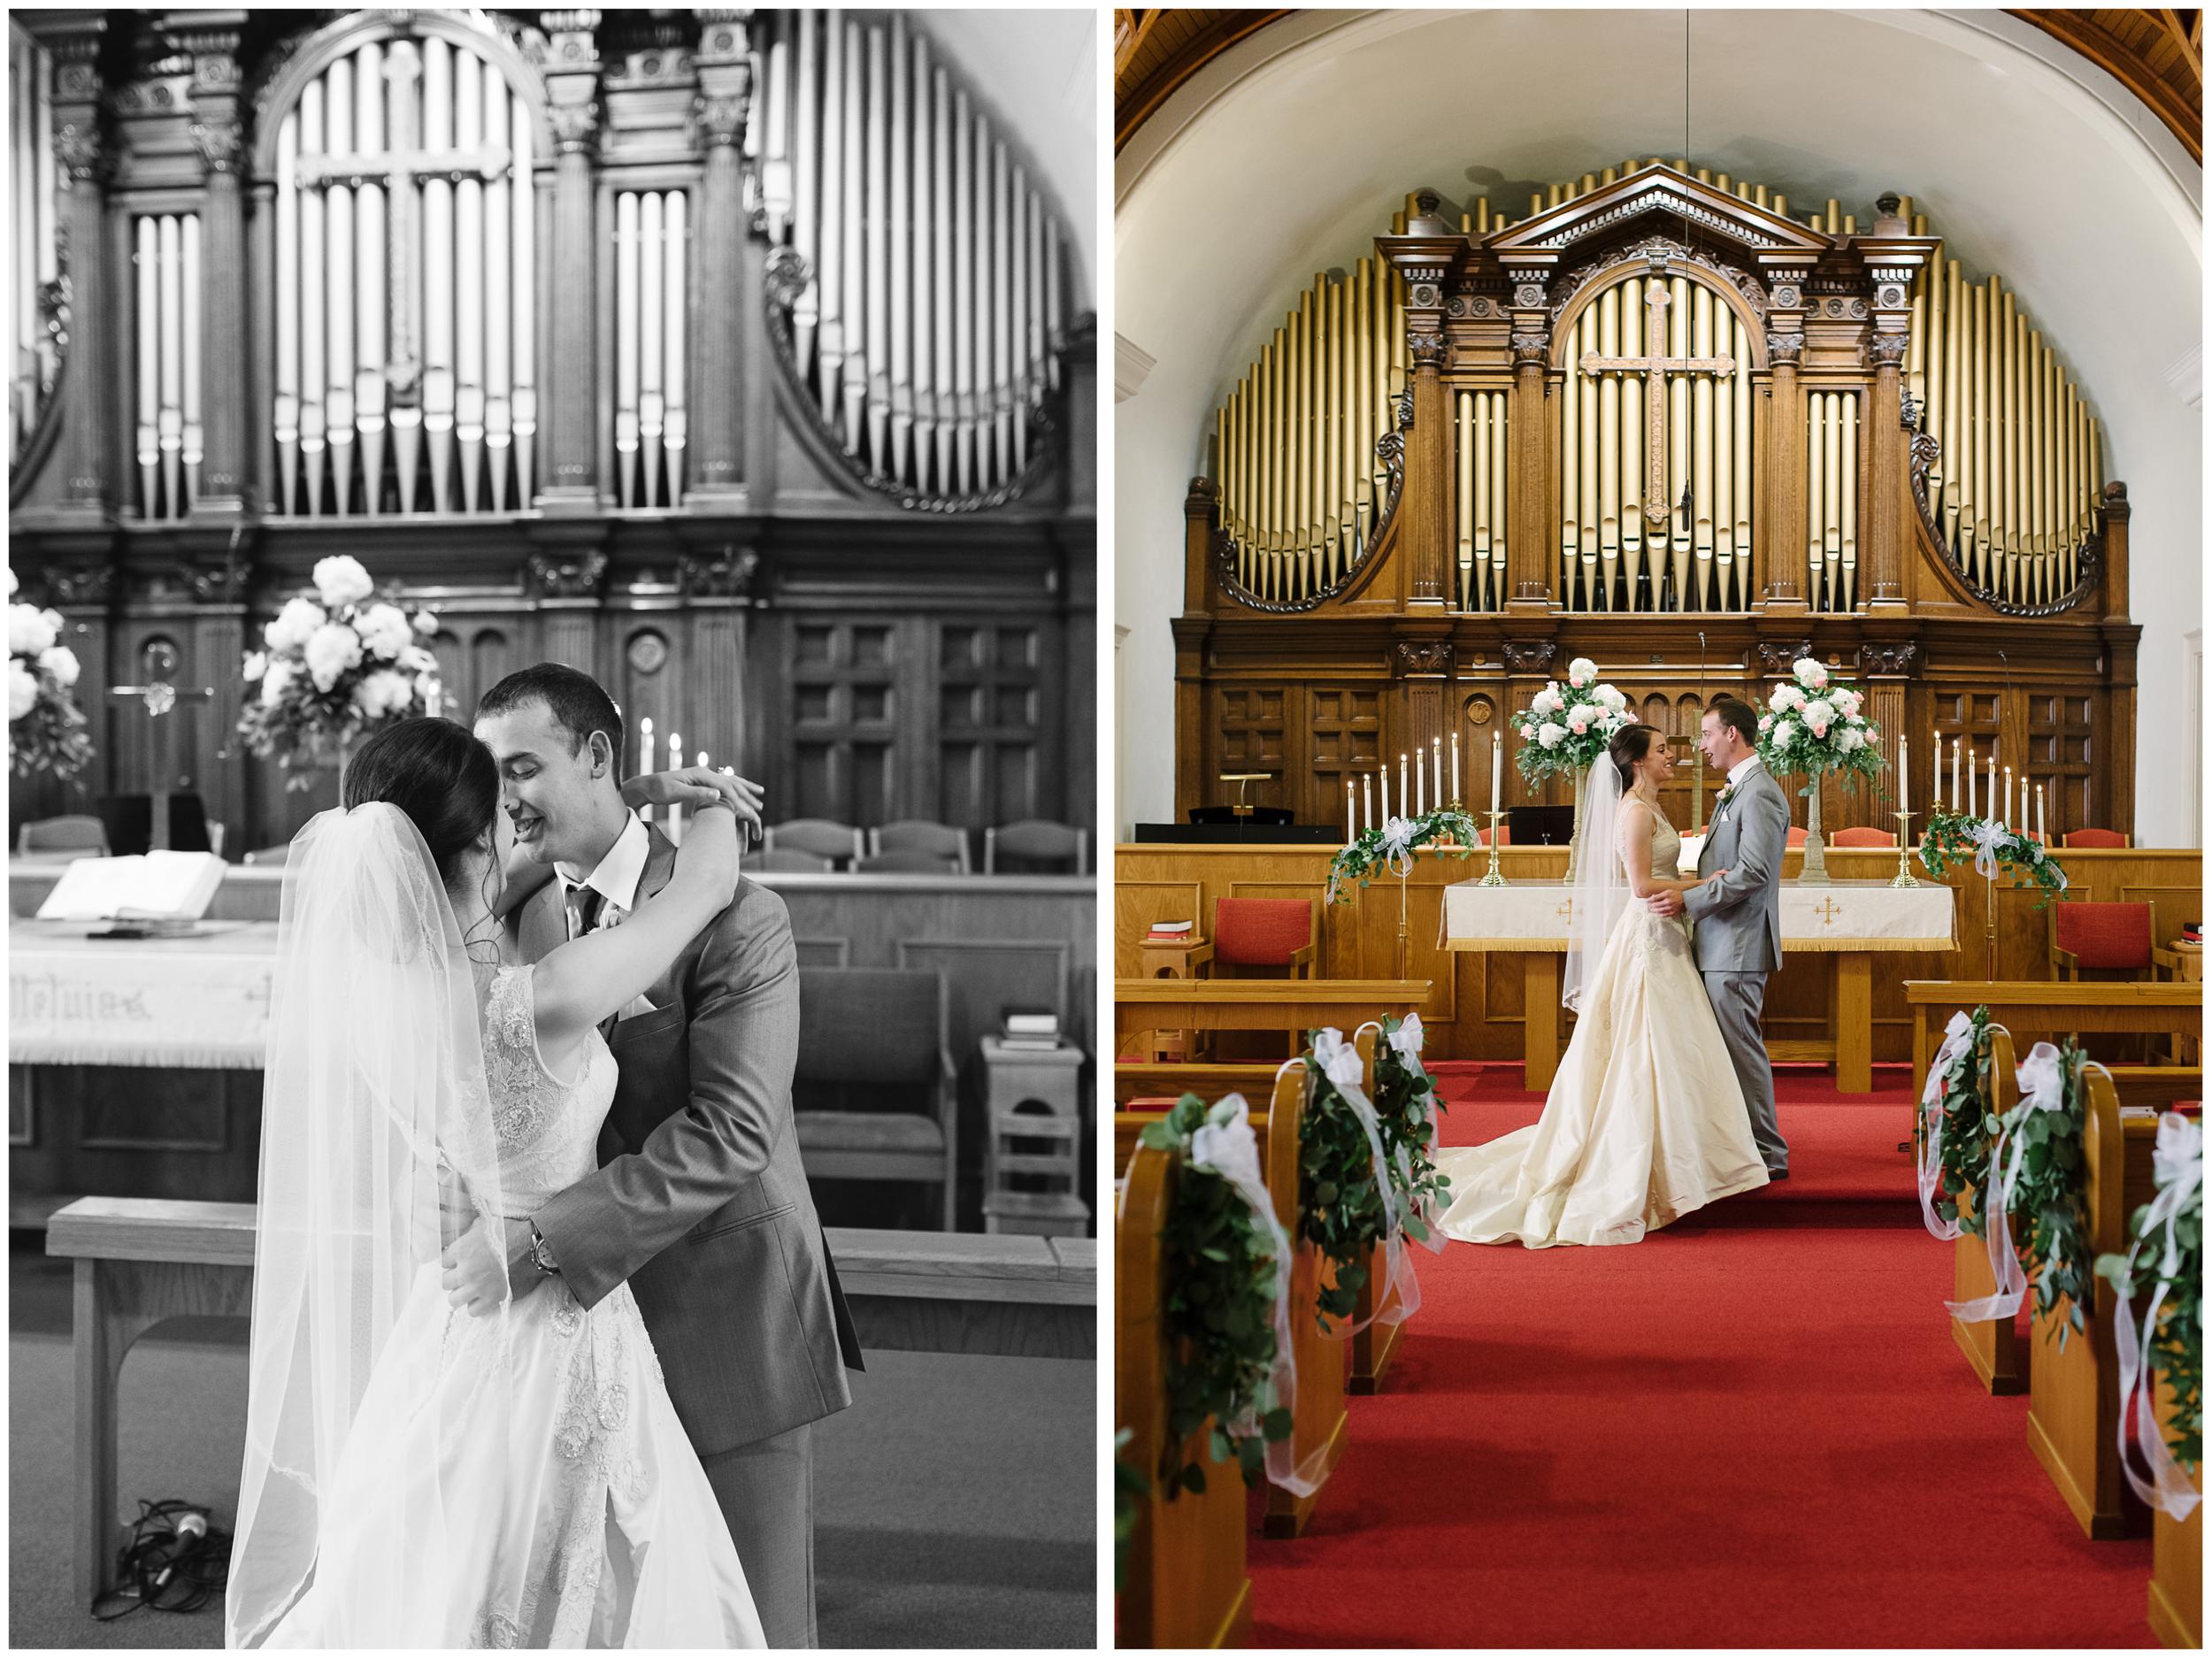 heritage methodist church wedding first look, mariah fisher.jpg